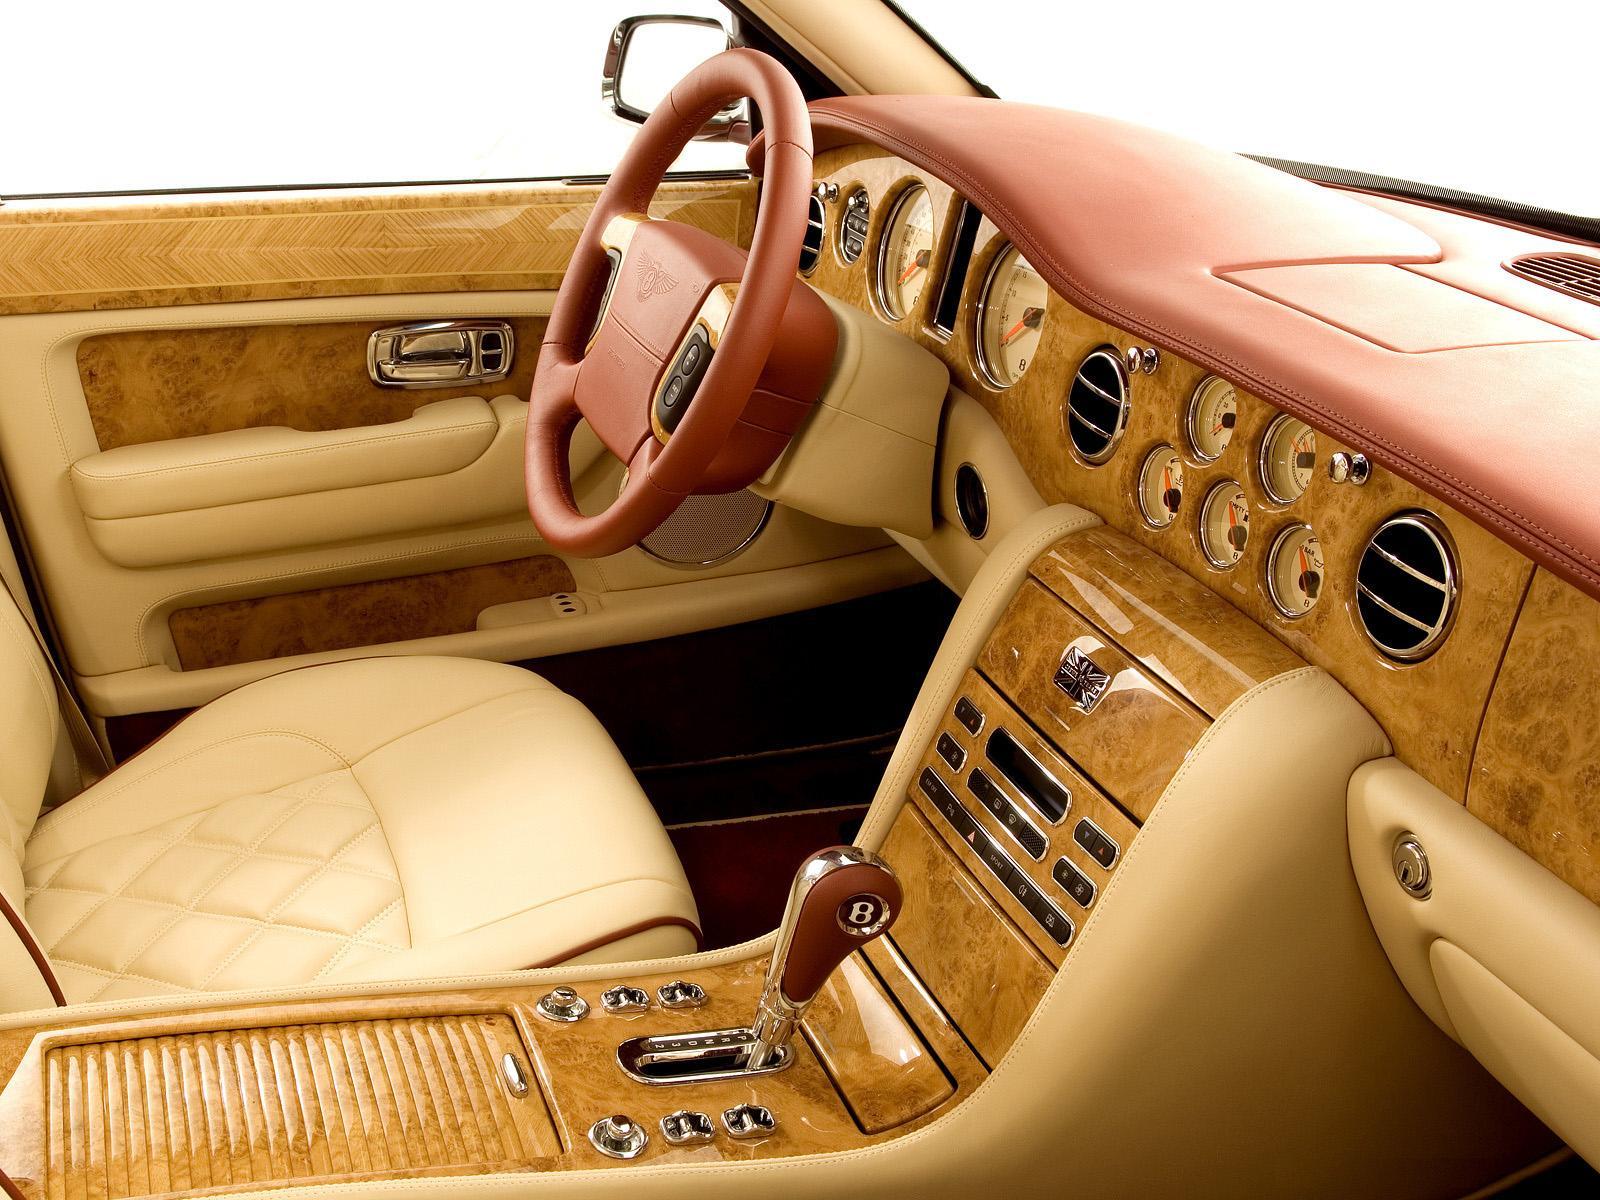 Bentley arnage photos photogallery with 33 pics carsbase bentley arnage pic vanachro Image collections